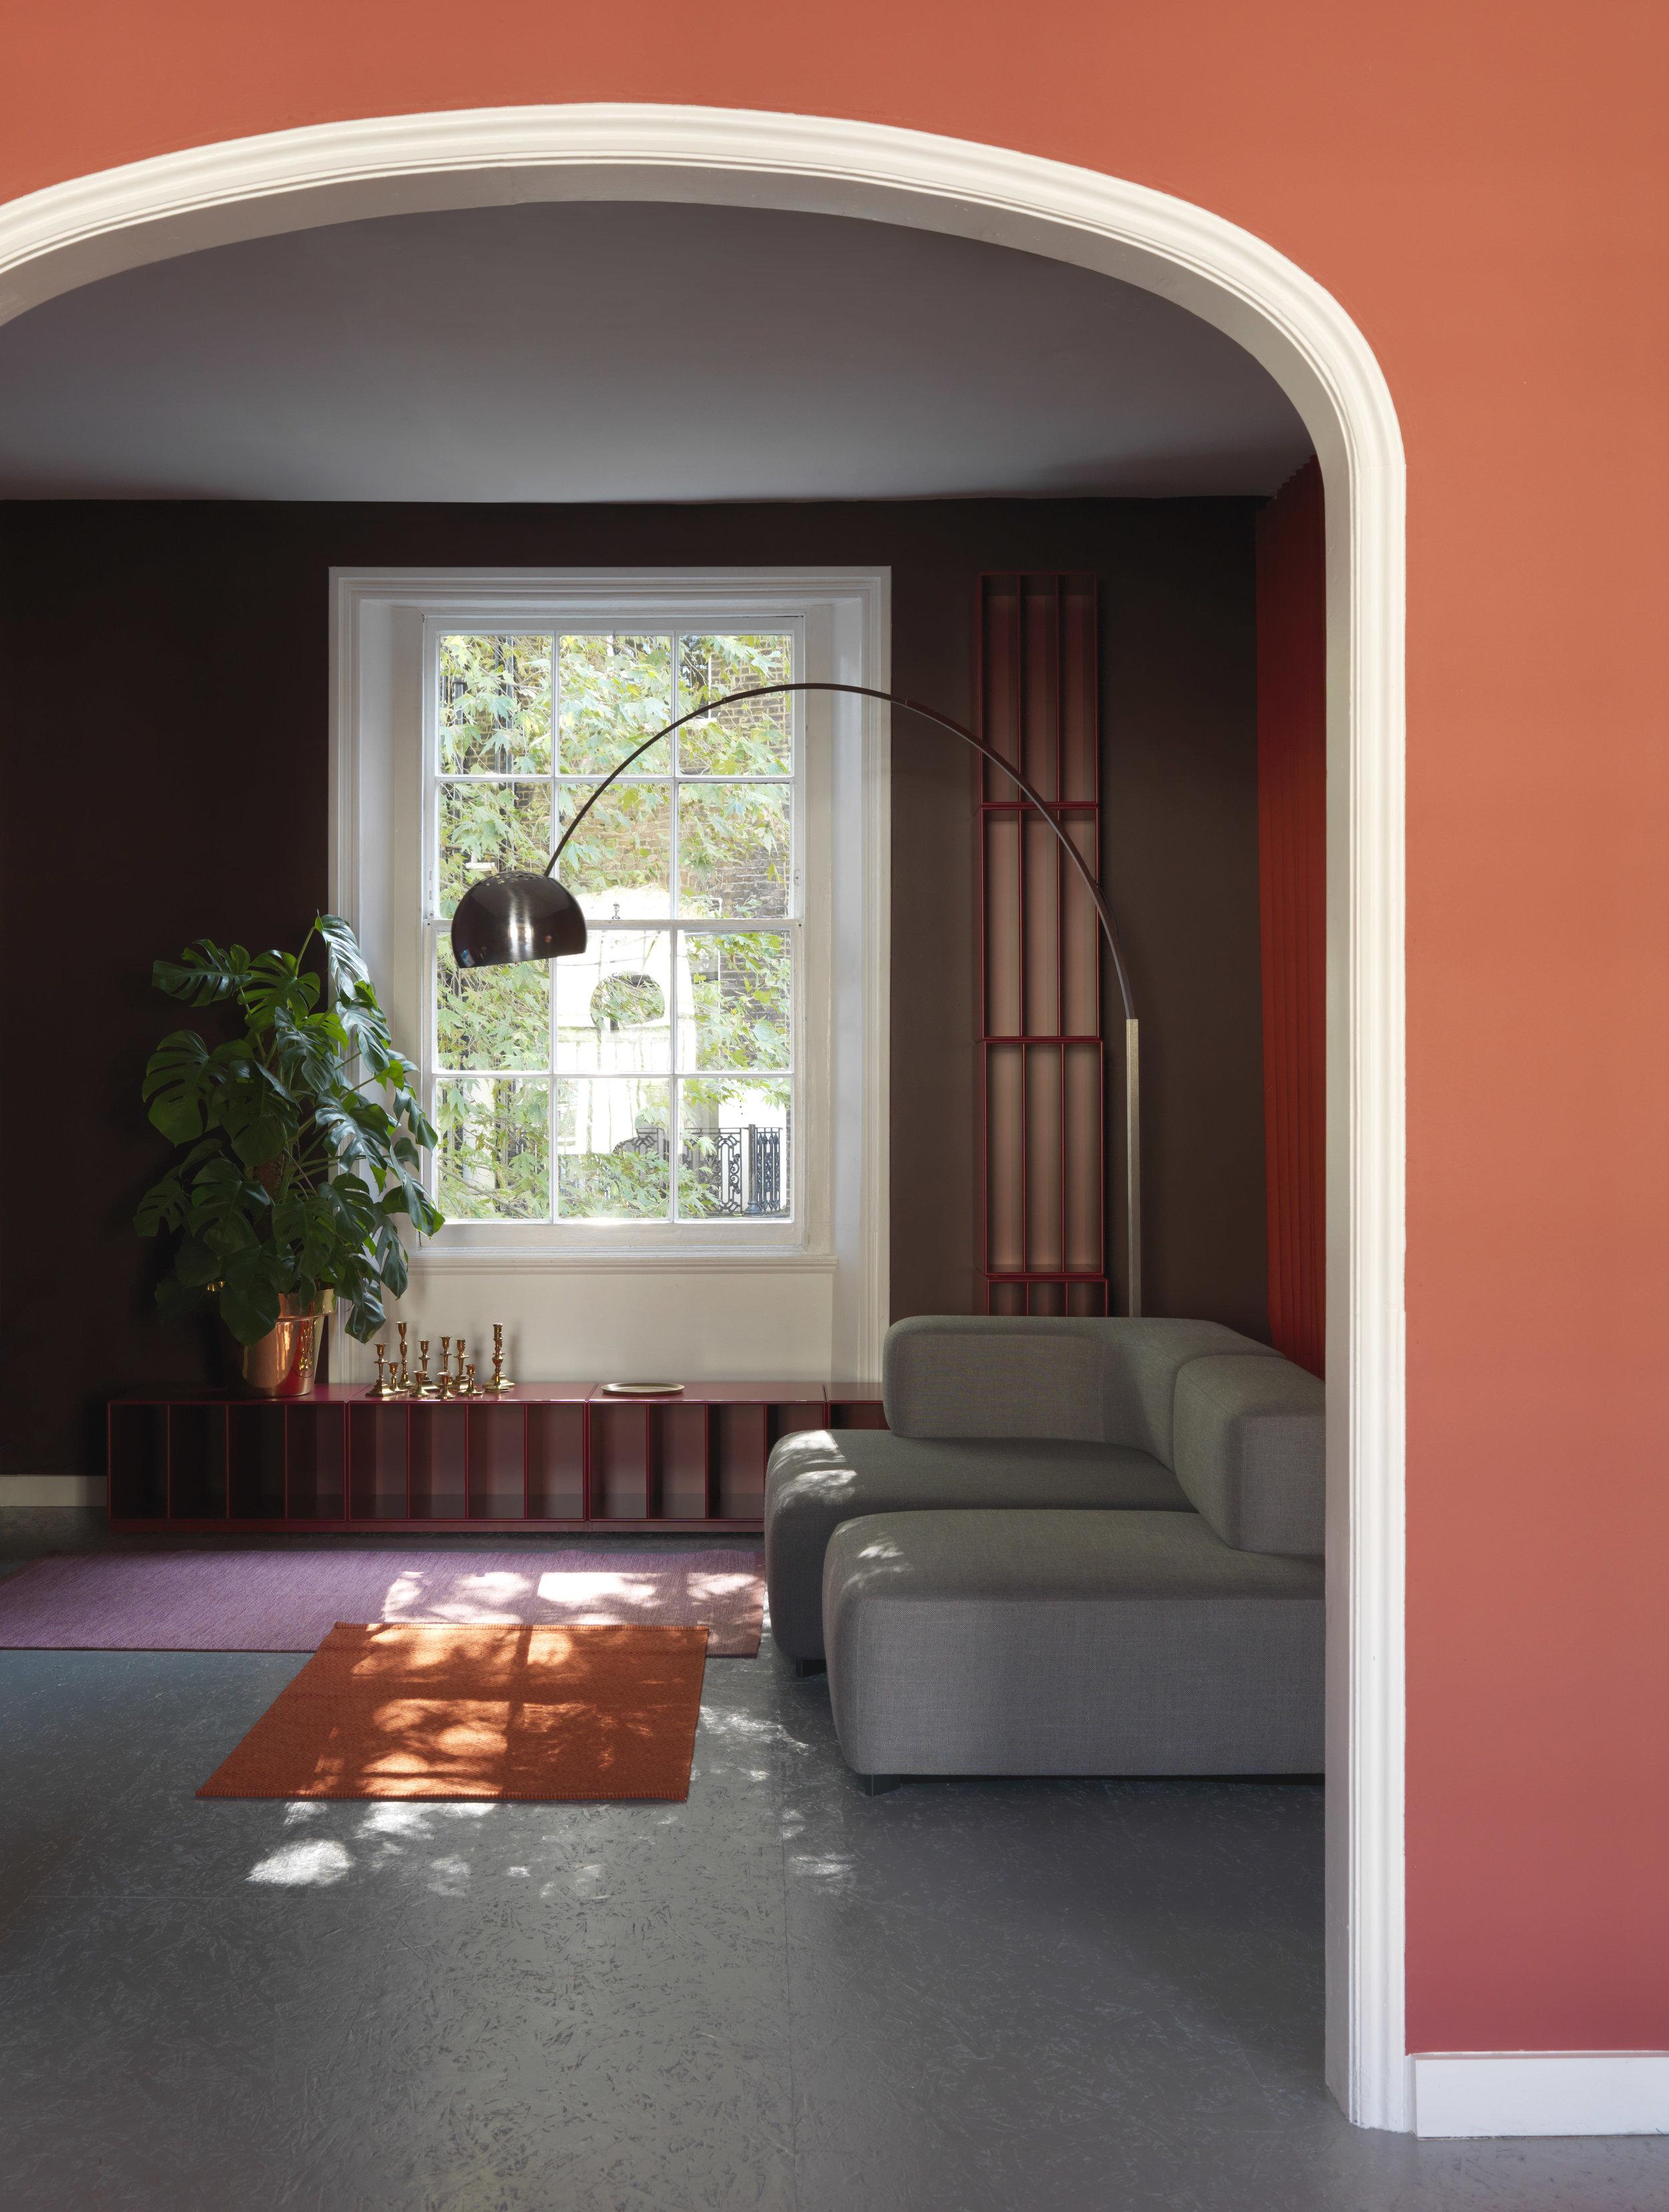 Montana designers Storage and shelving systems London Design Week home interior Scandinavian design Scandinavian home 5.jpg